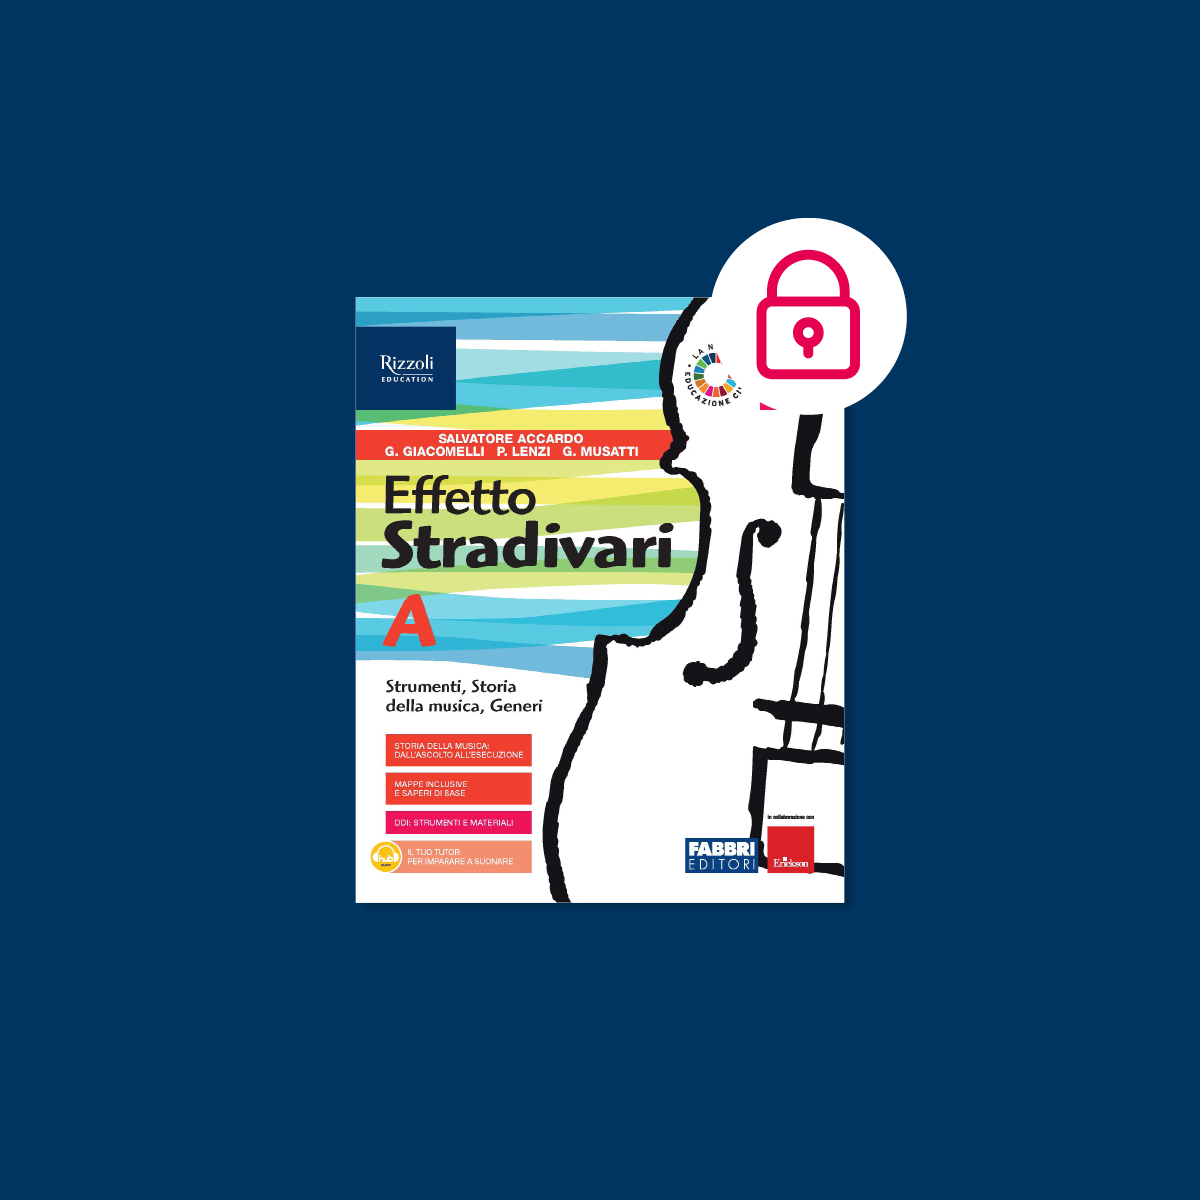 Effetto Stradivari